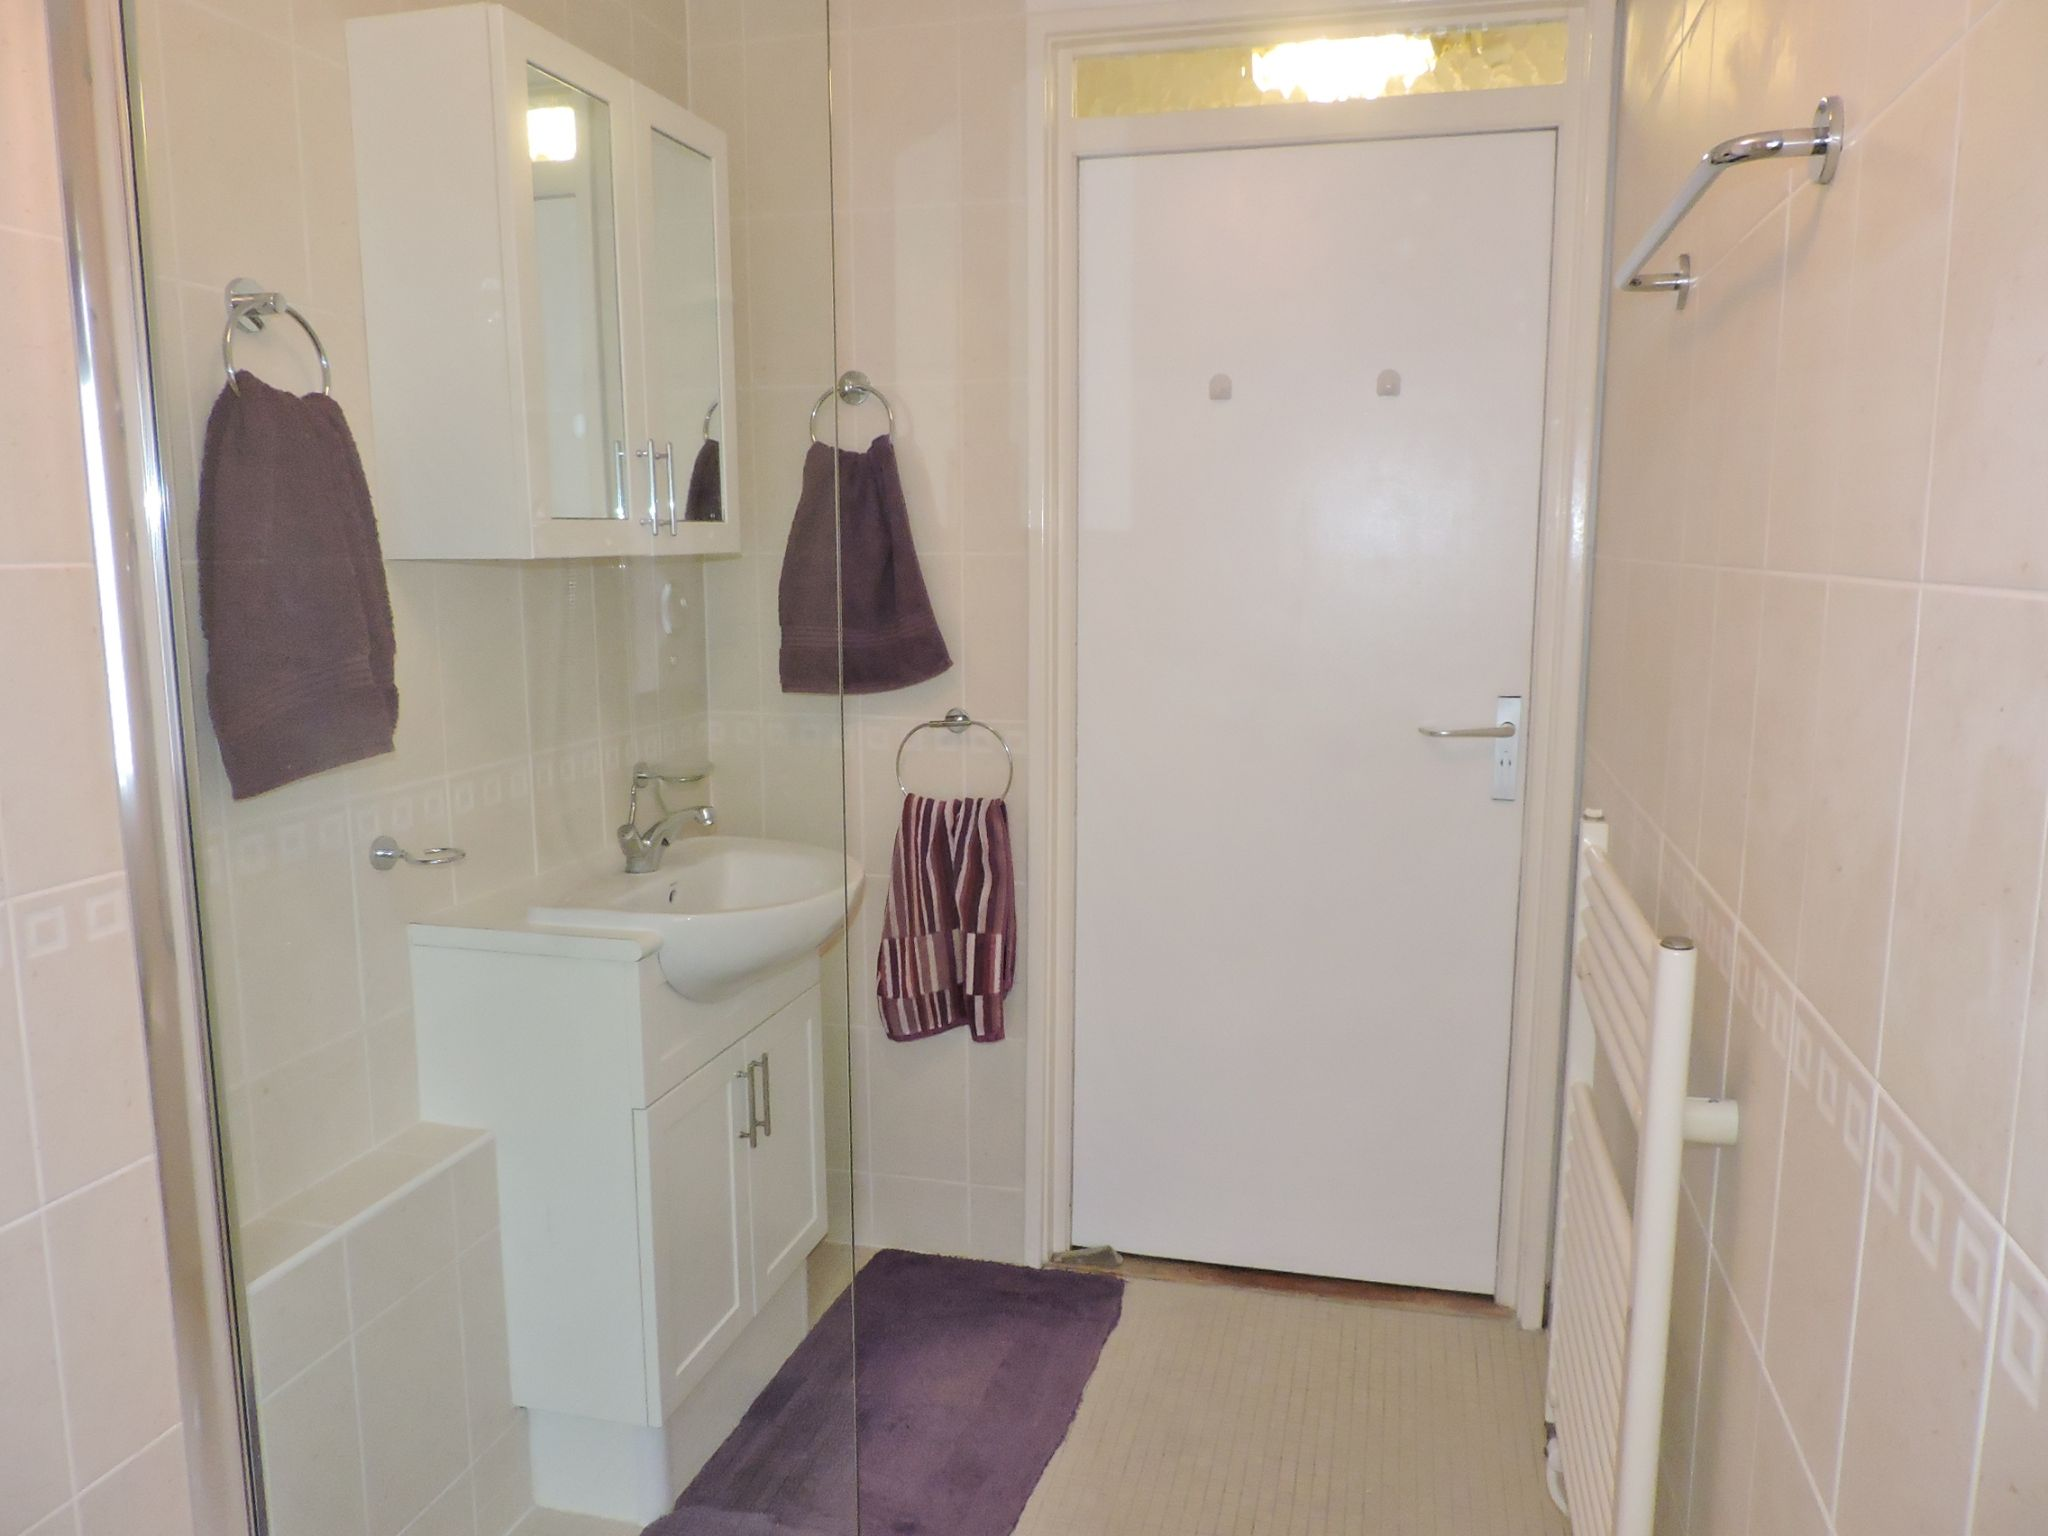 1 bedroom ground floor maisonette flat/apartment Sale Agreed in New Malden - Photograph 9